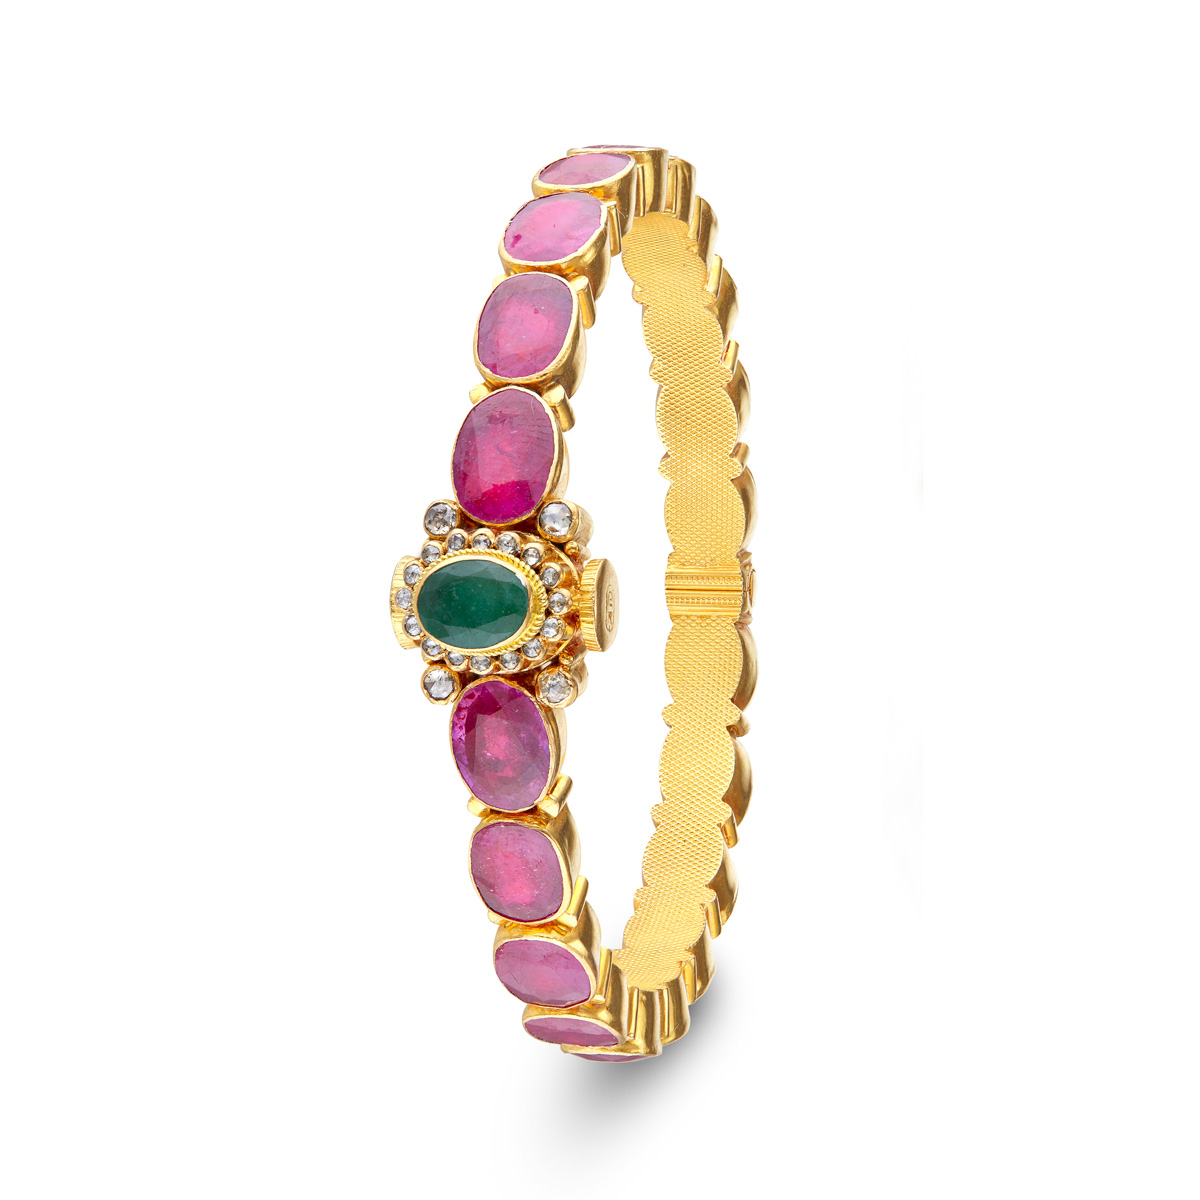 Oval Emerald&Rubies!